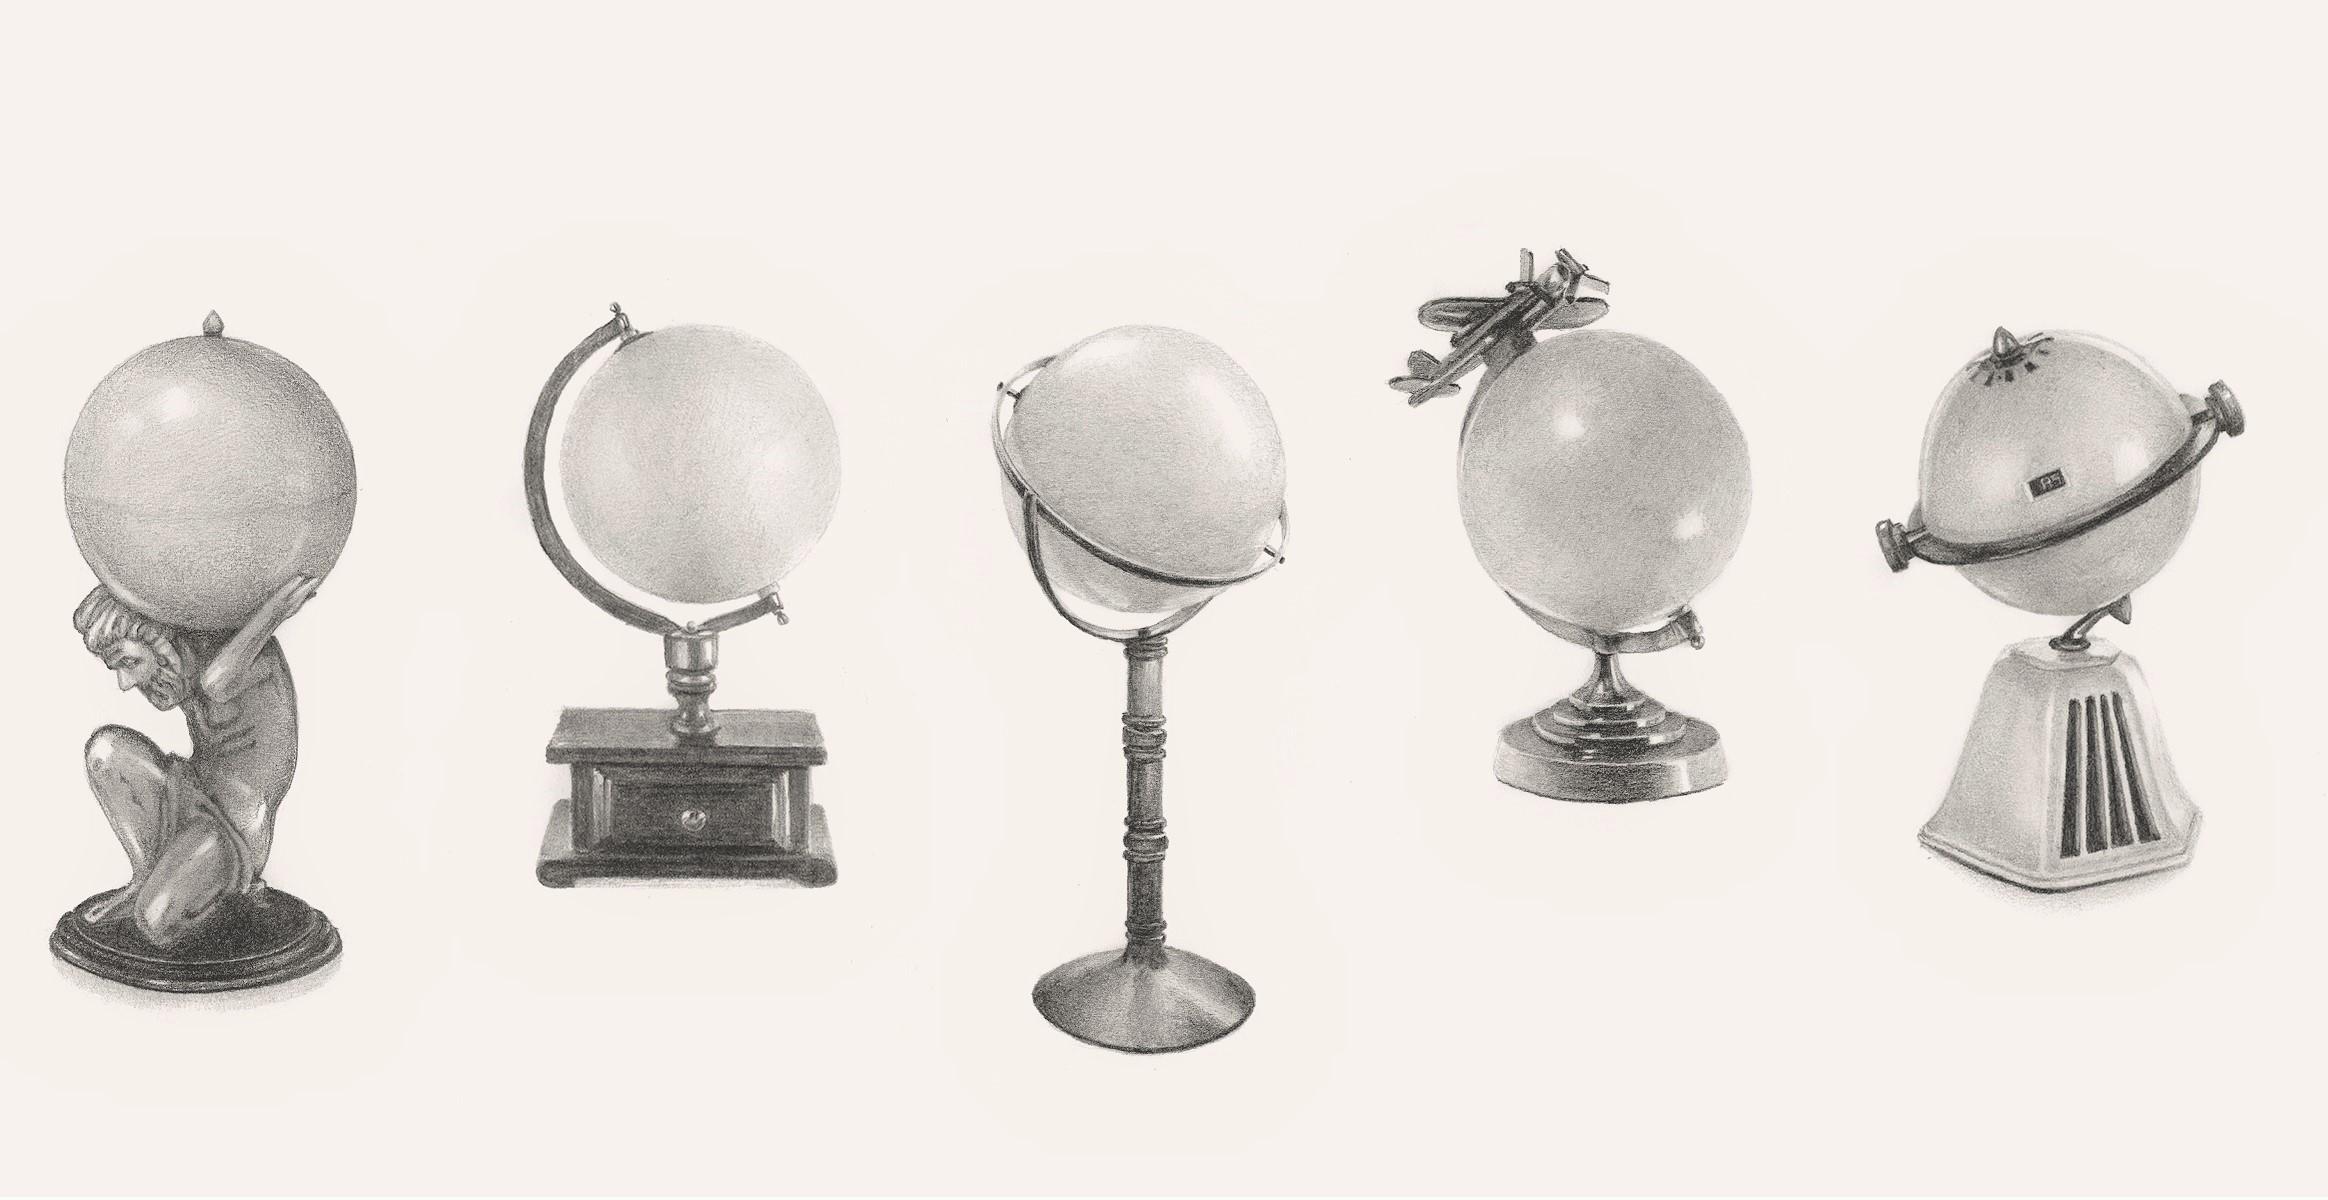 hondartza-fraga-365-globes-composite-2015